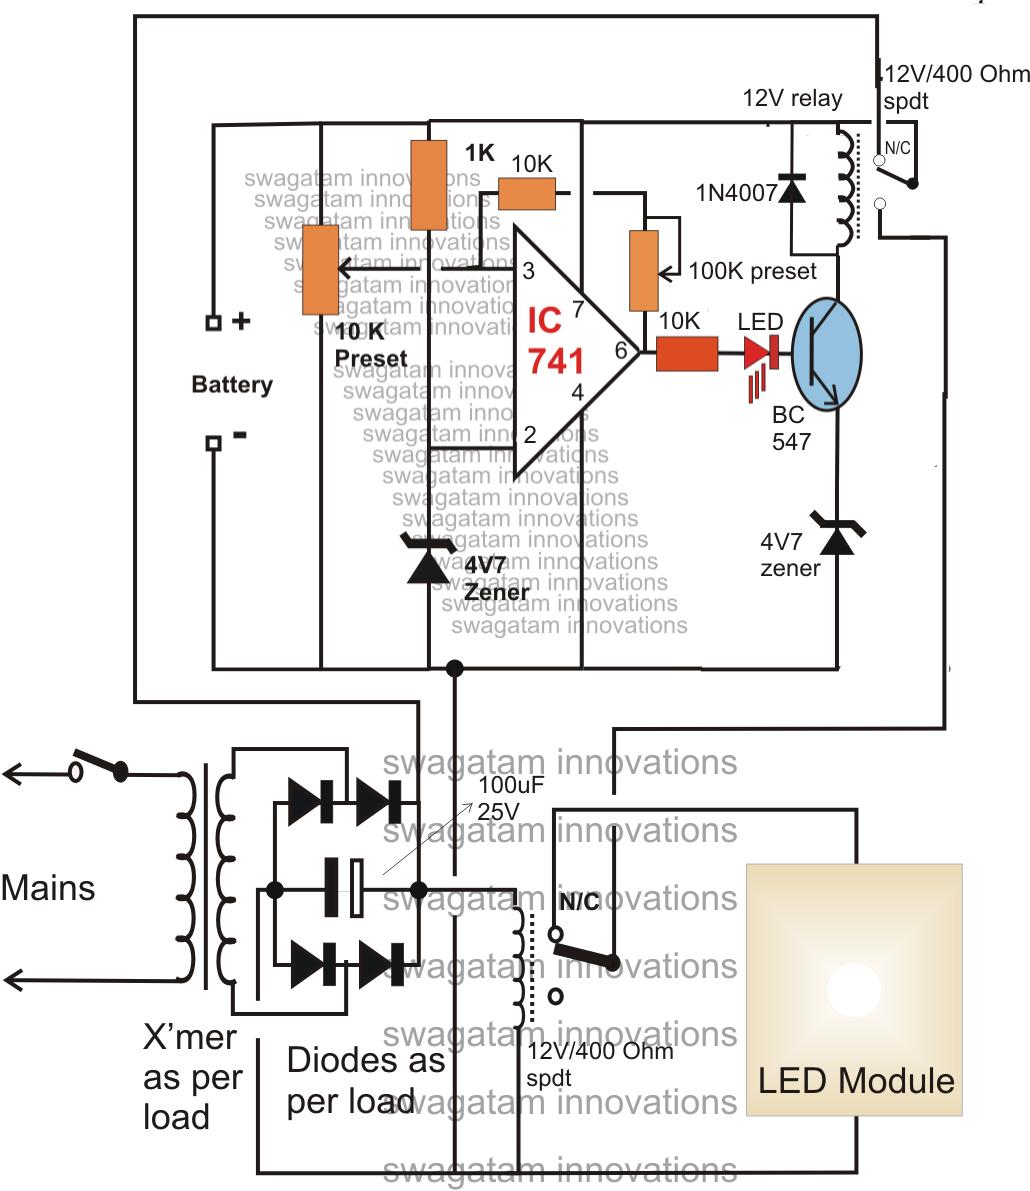 1000 Watt Light Wiring Diagram 2002 Subaru Forester Stereo Wiring Diagram Clubcar Yenpancane Jeanjaures37 Fr